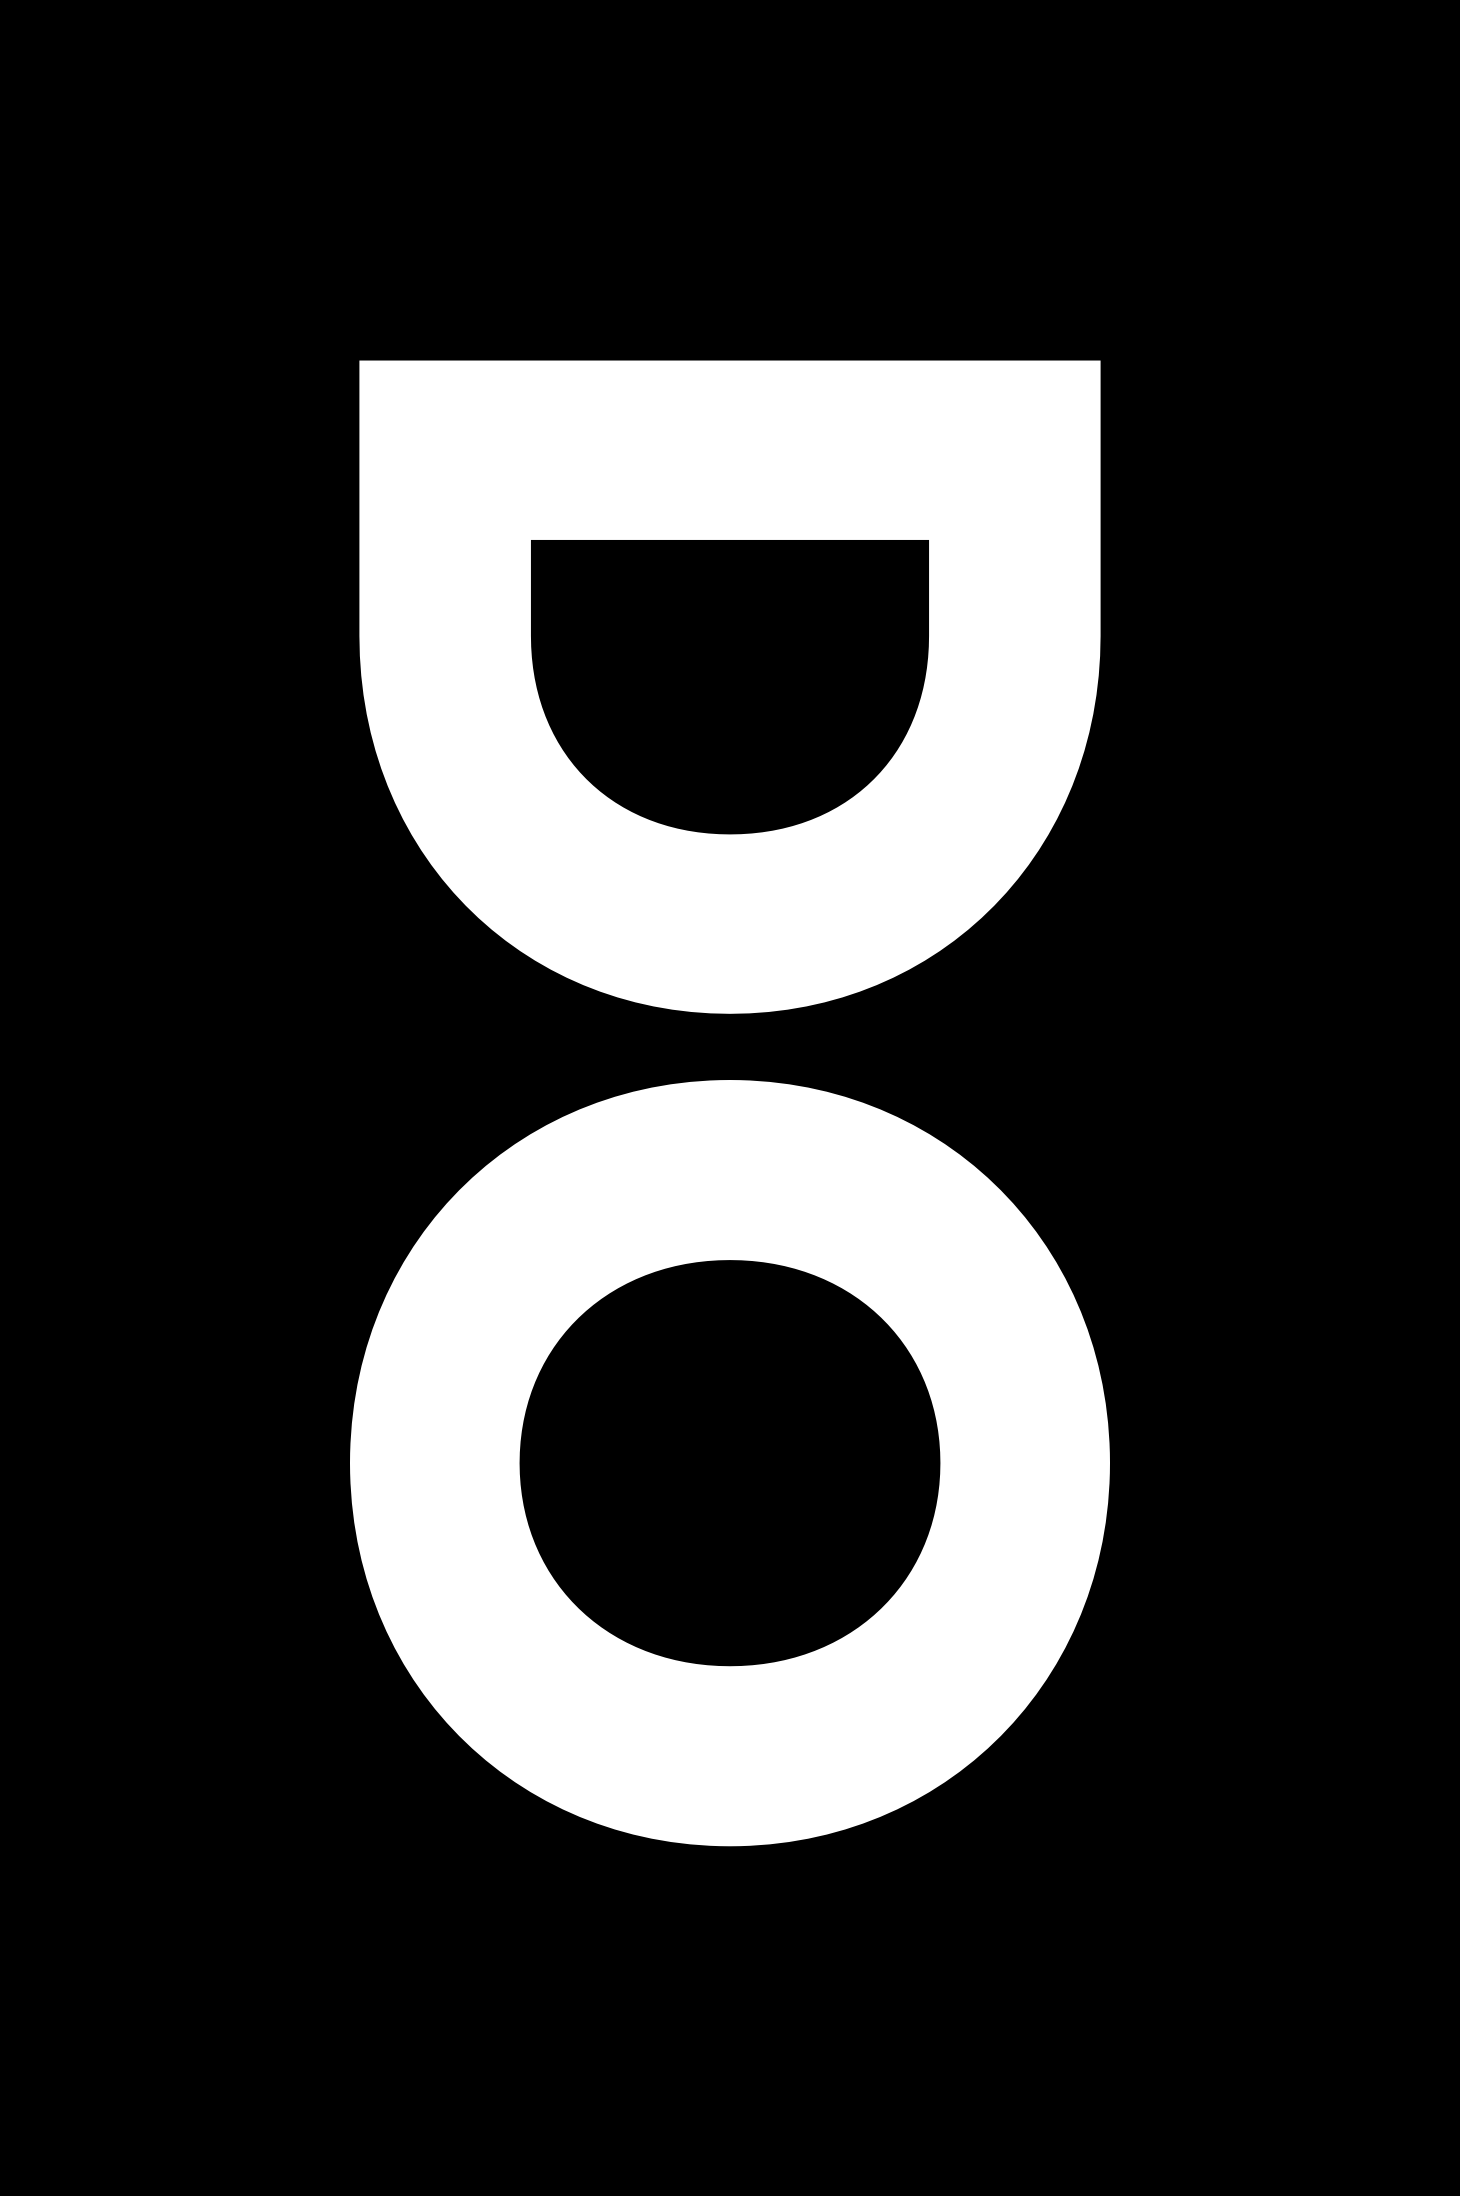 do_solid_black.png